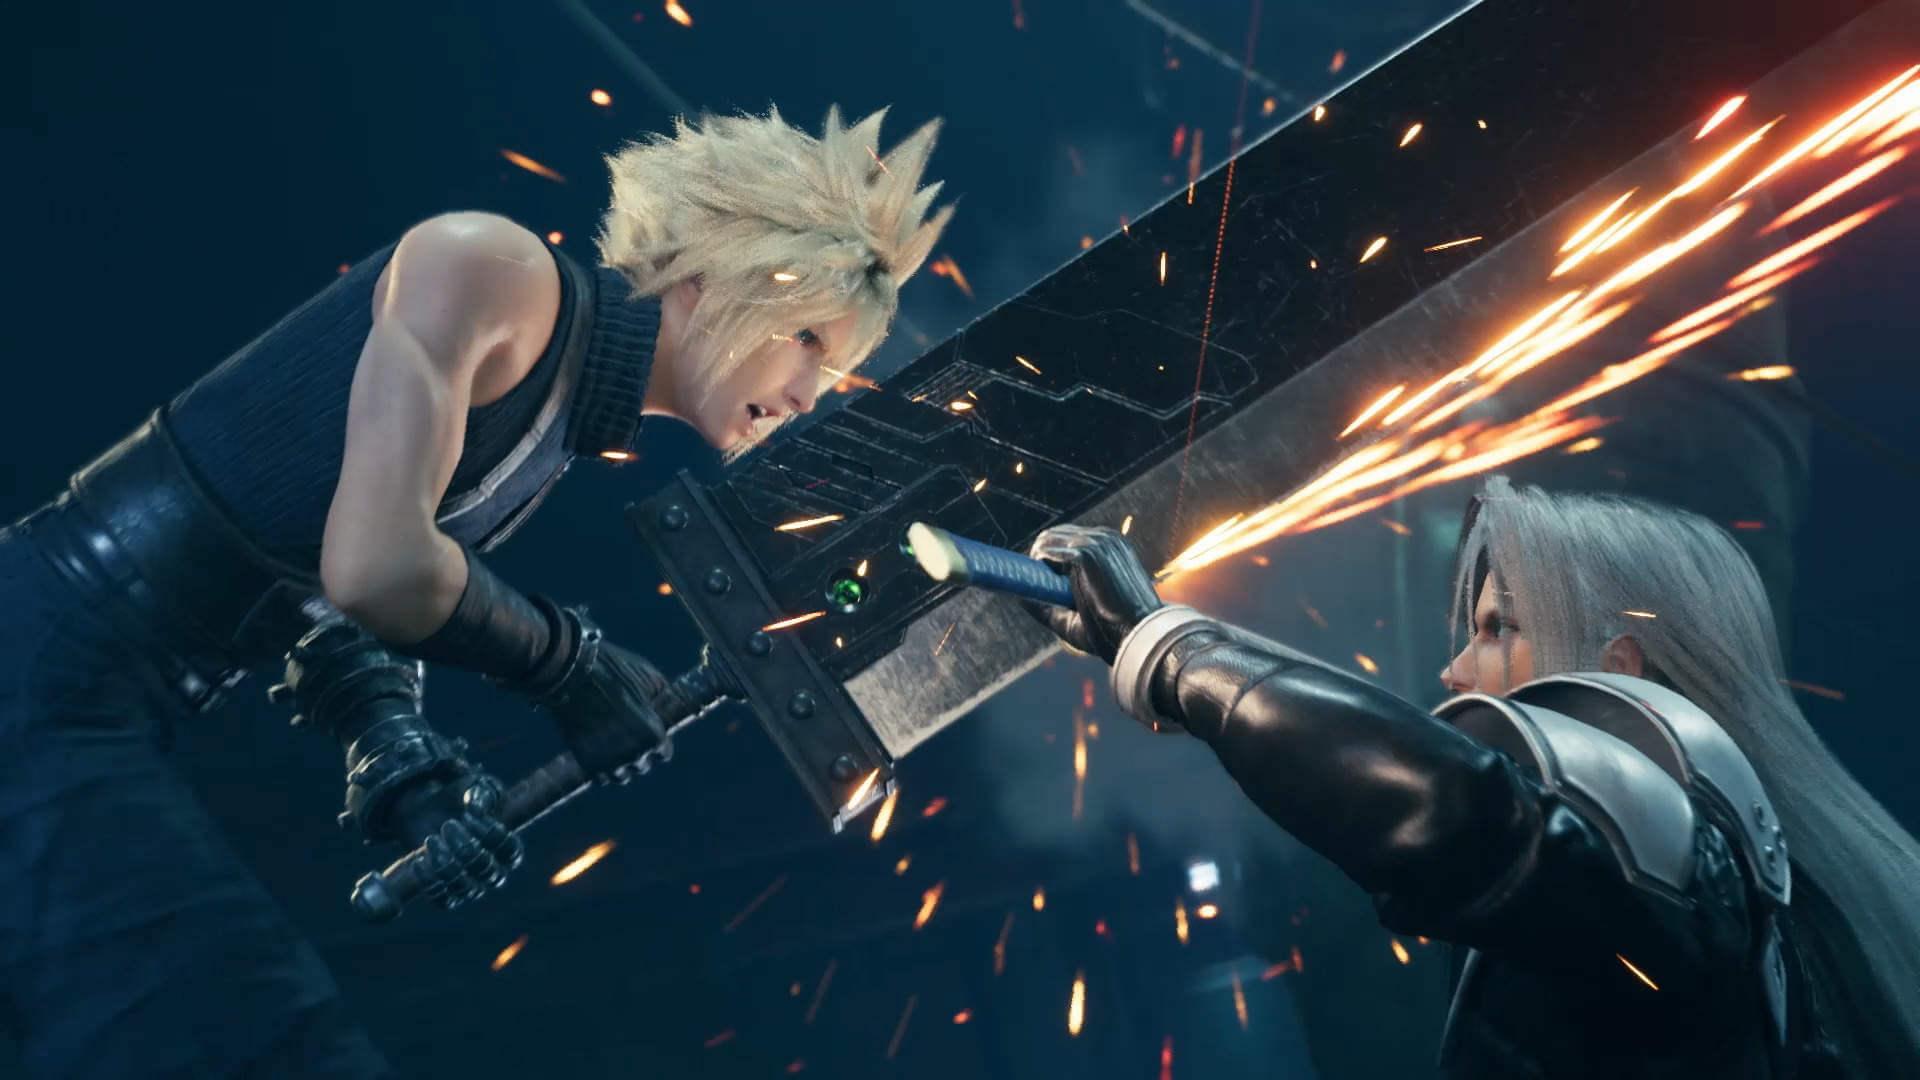 史克威爾艾尼克斯用虛幻引擎重制《最終幻想7》 - Unreal Engine